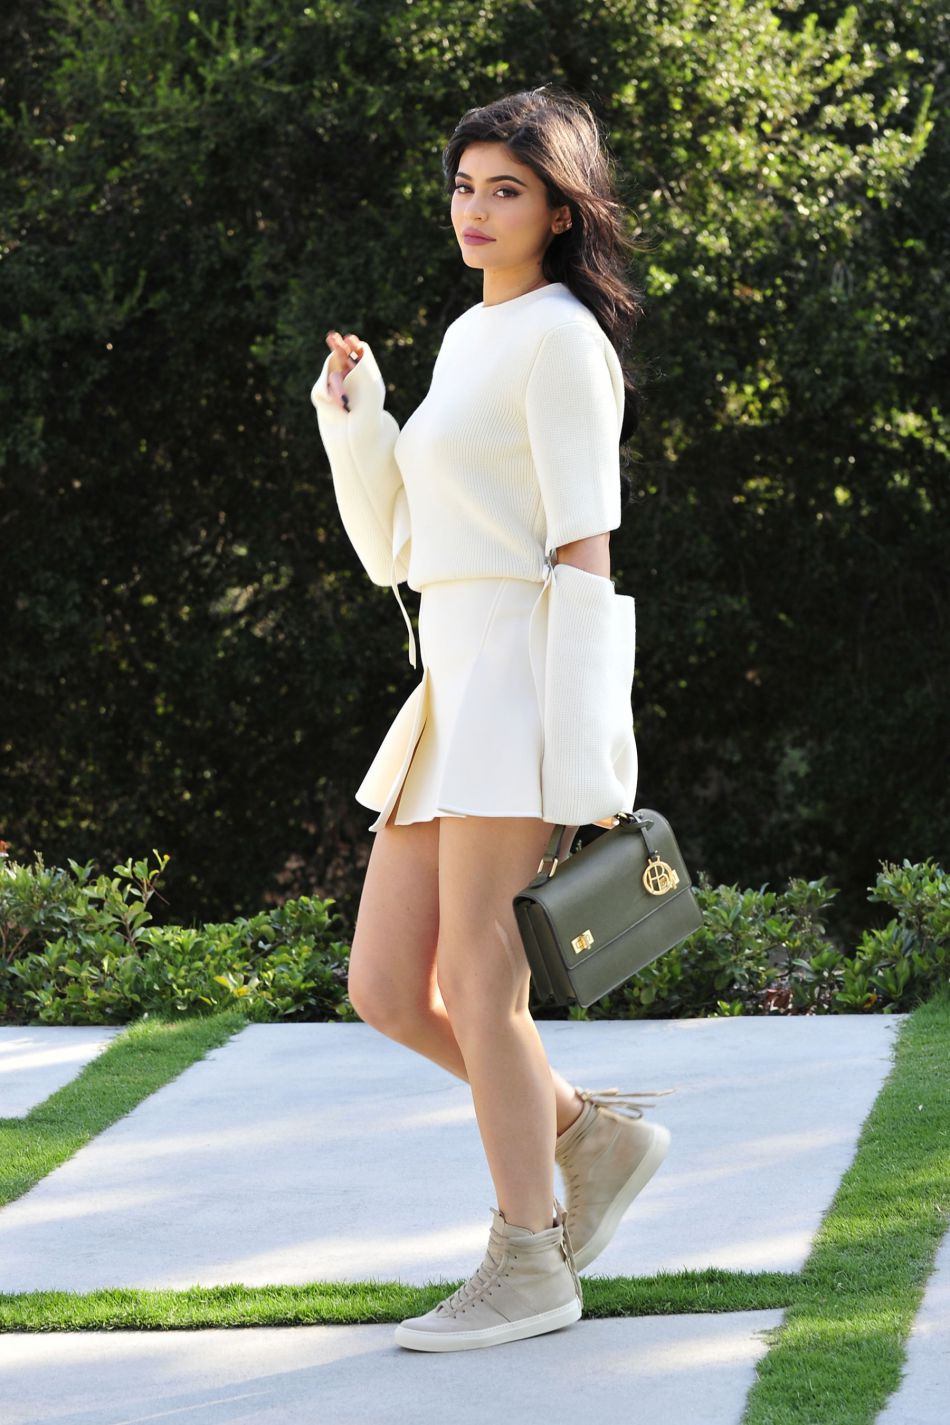 A 19 ans, Kylie Jenner est toujours plus sexy.